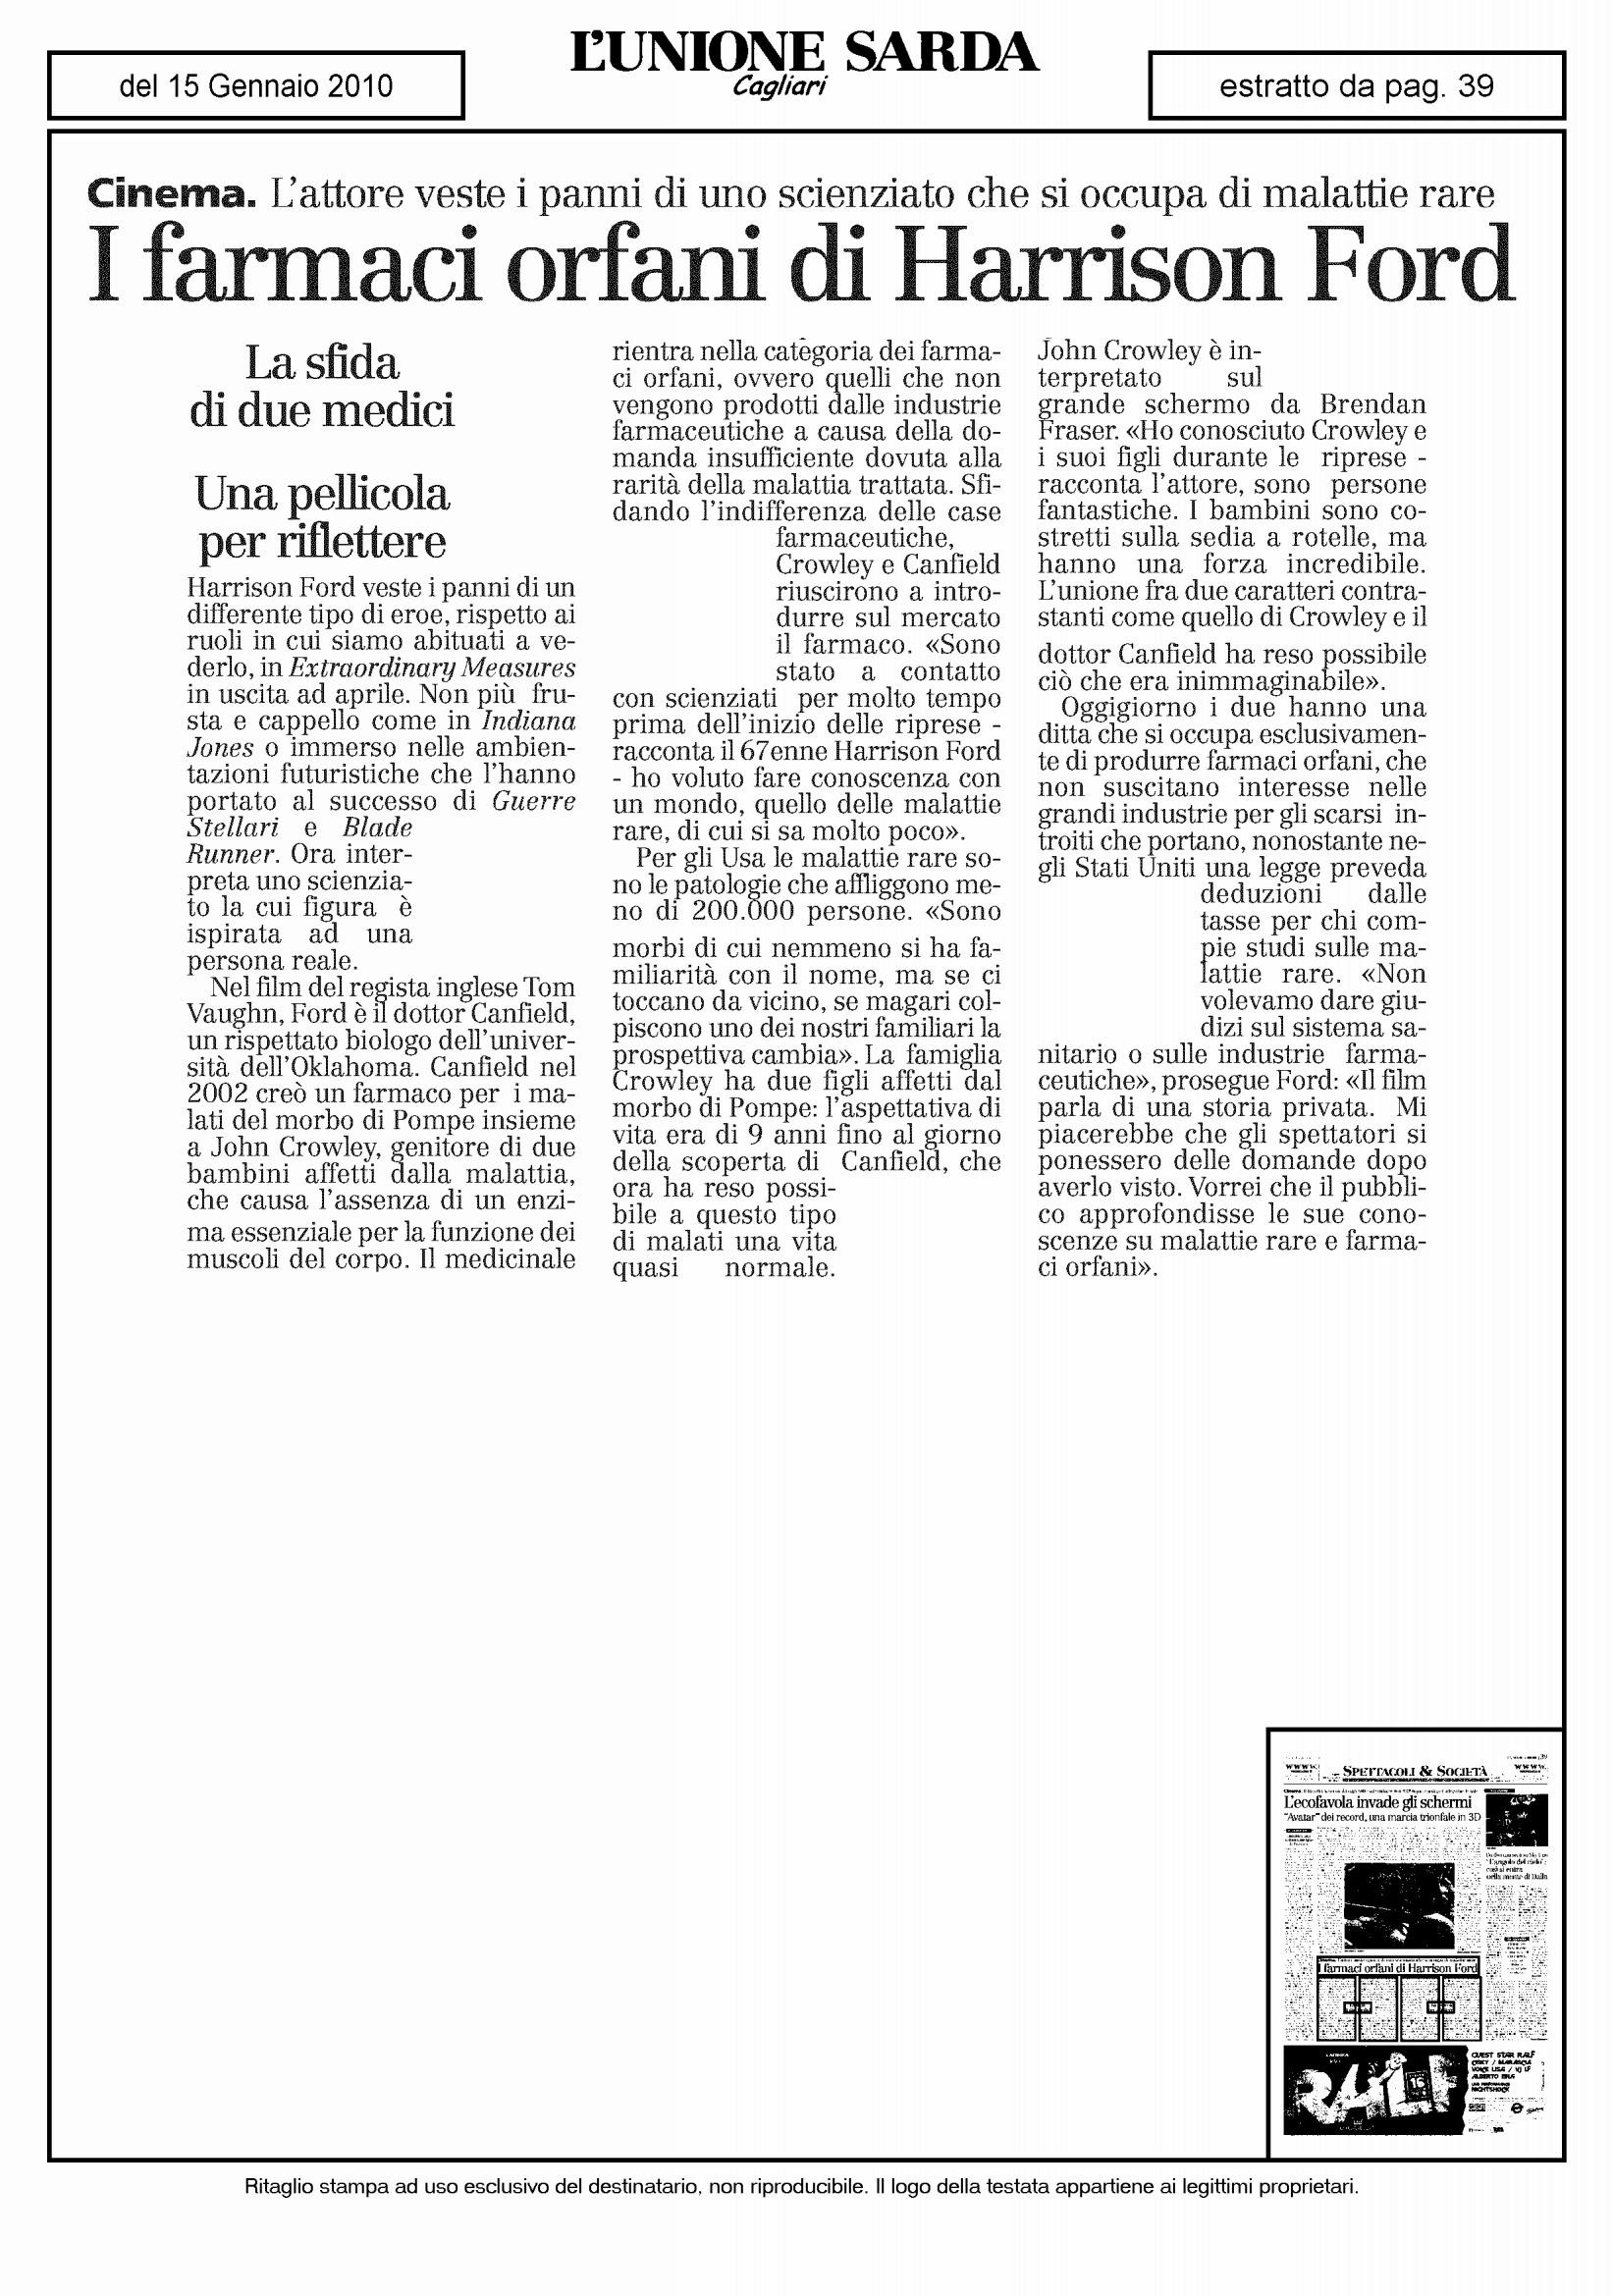 Stampa_20100422_misure straordinarie_Page_99